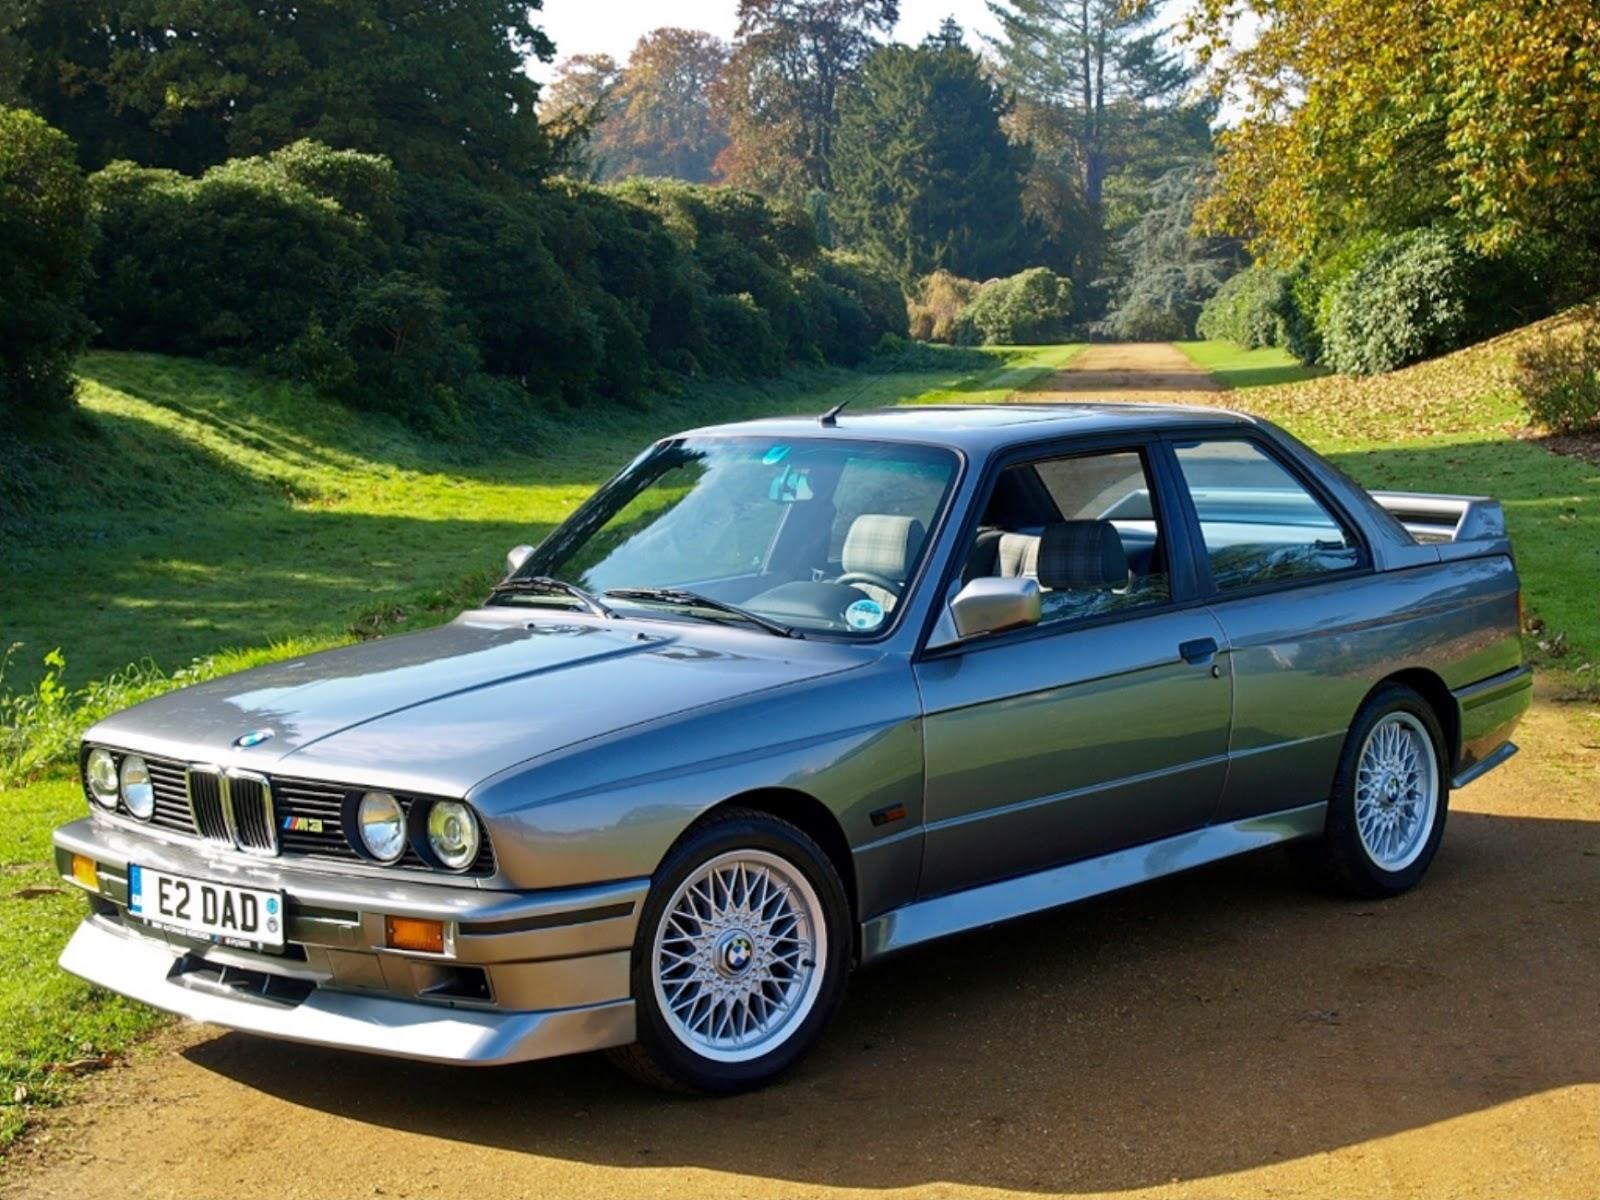 1988 BMW M3 E30 Evolution II | All Cars New Zealand